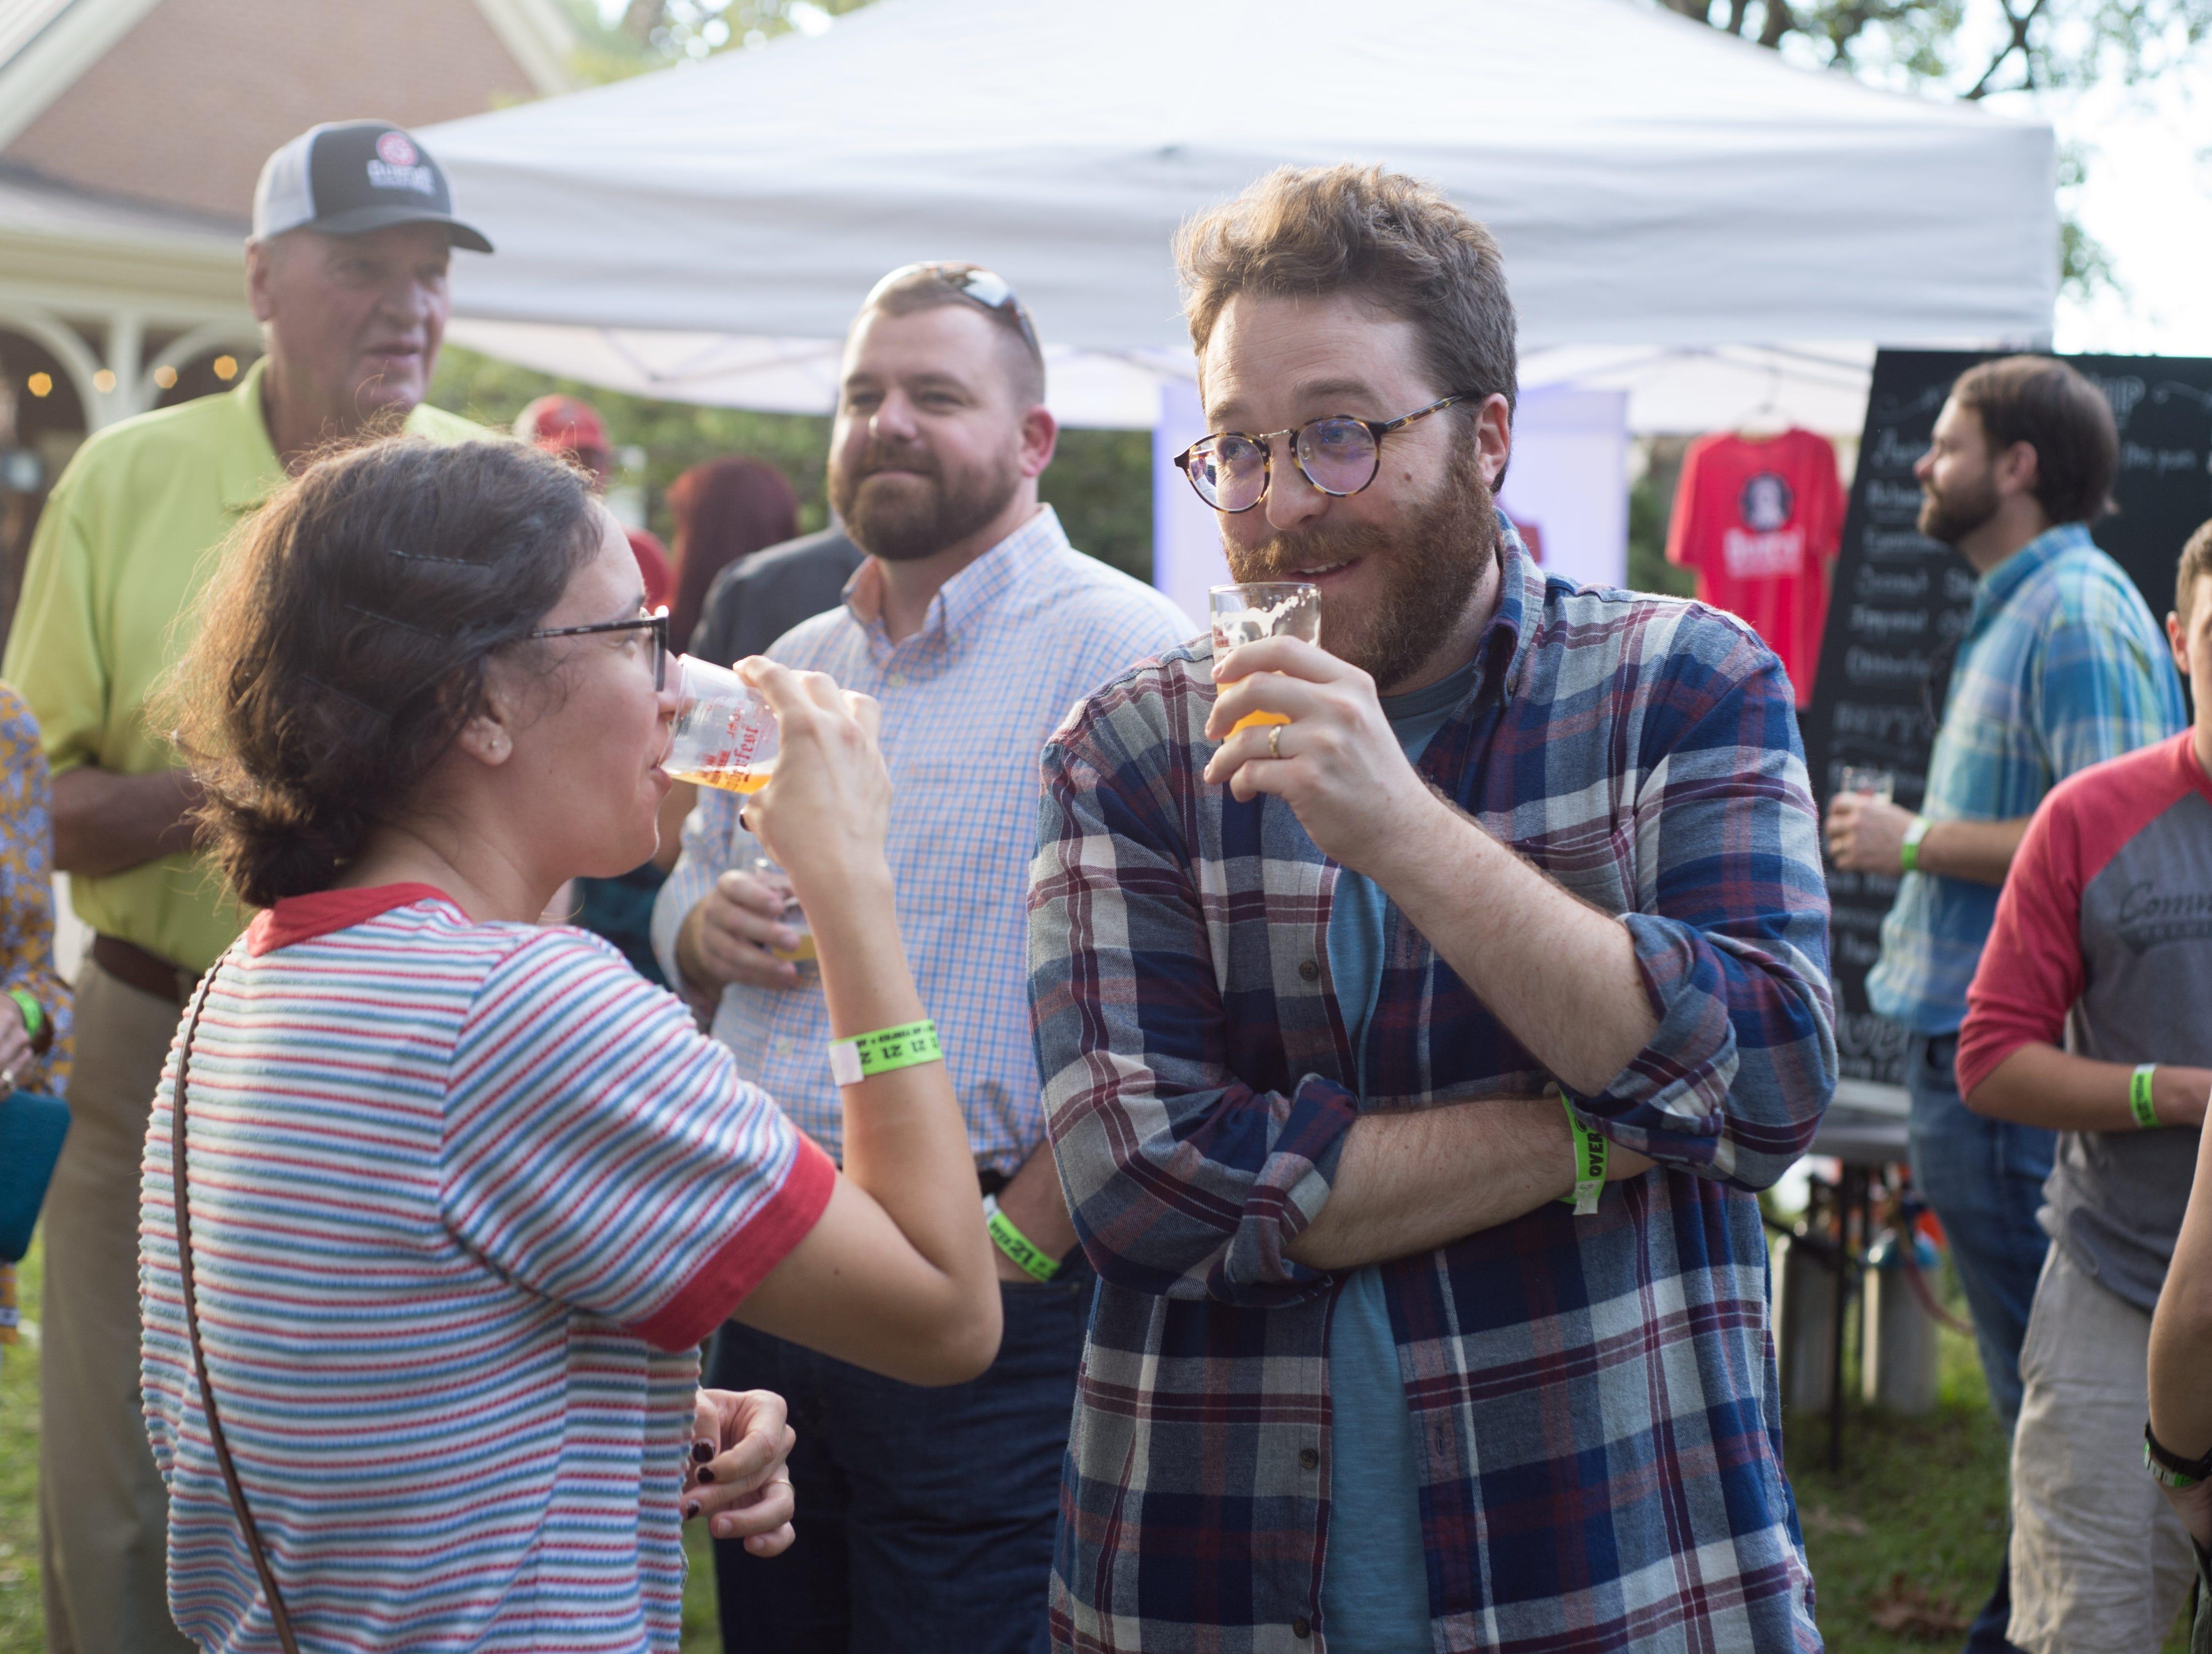 Lauren Gallina and Rob Wilson enjoy tasting samples during Oktoberfest at Oaklands Mansion in Murfreesboro on Saturday, Sept. 29.